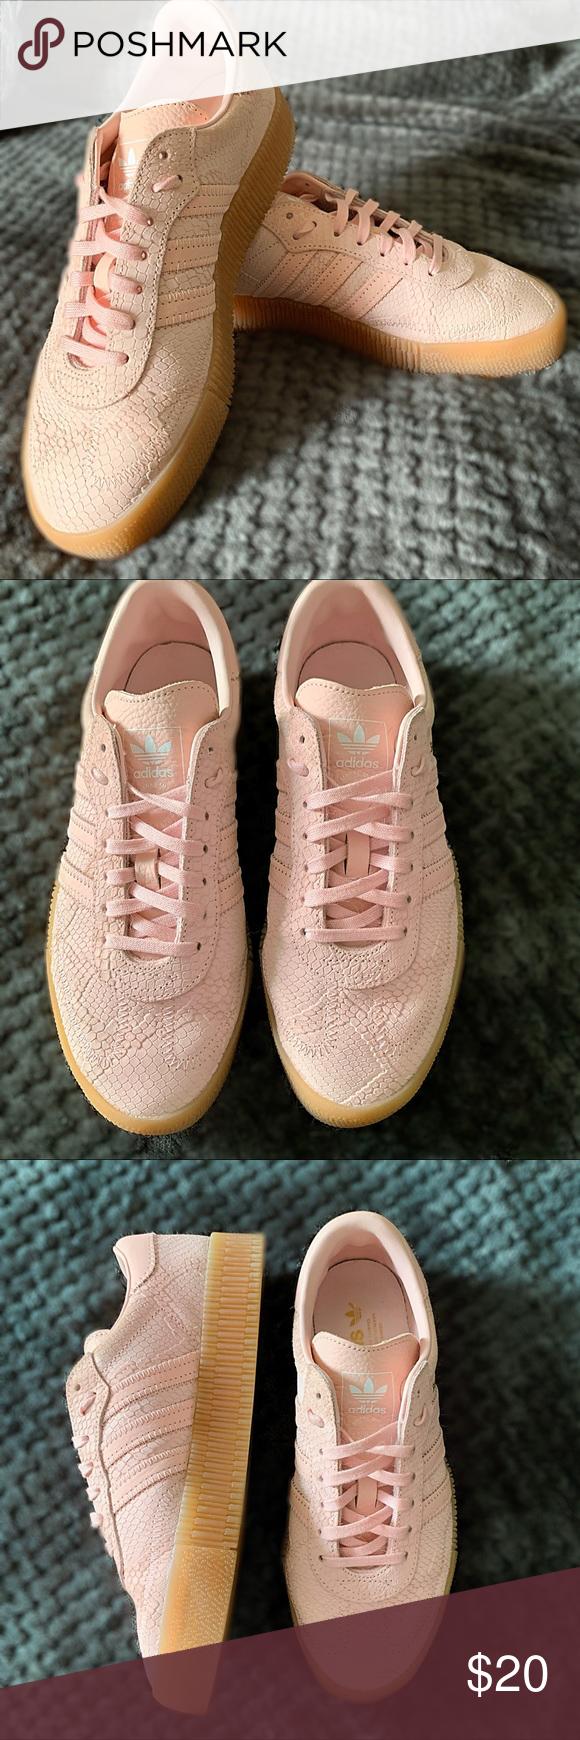 Samba Rose Icy Pink Shoes Adidas Samba